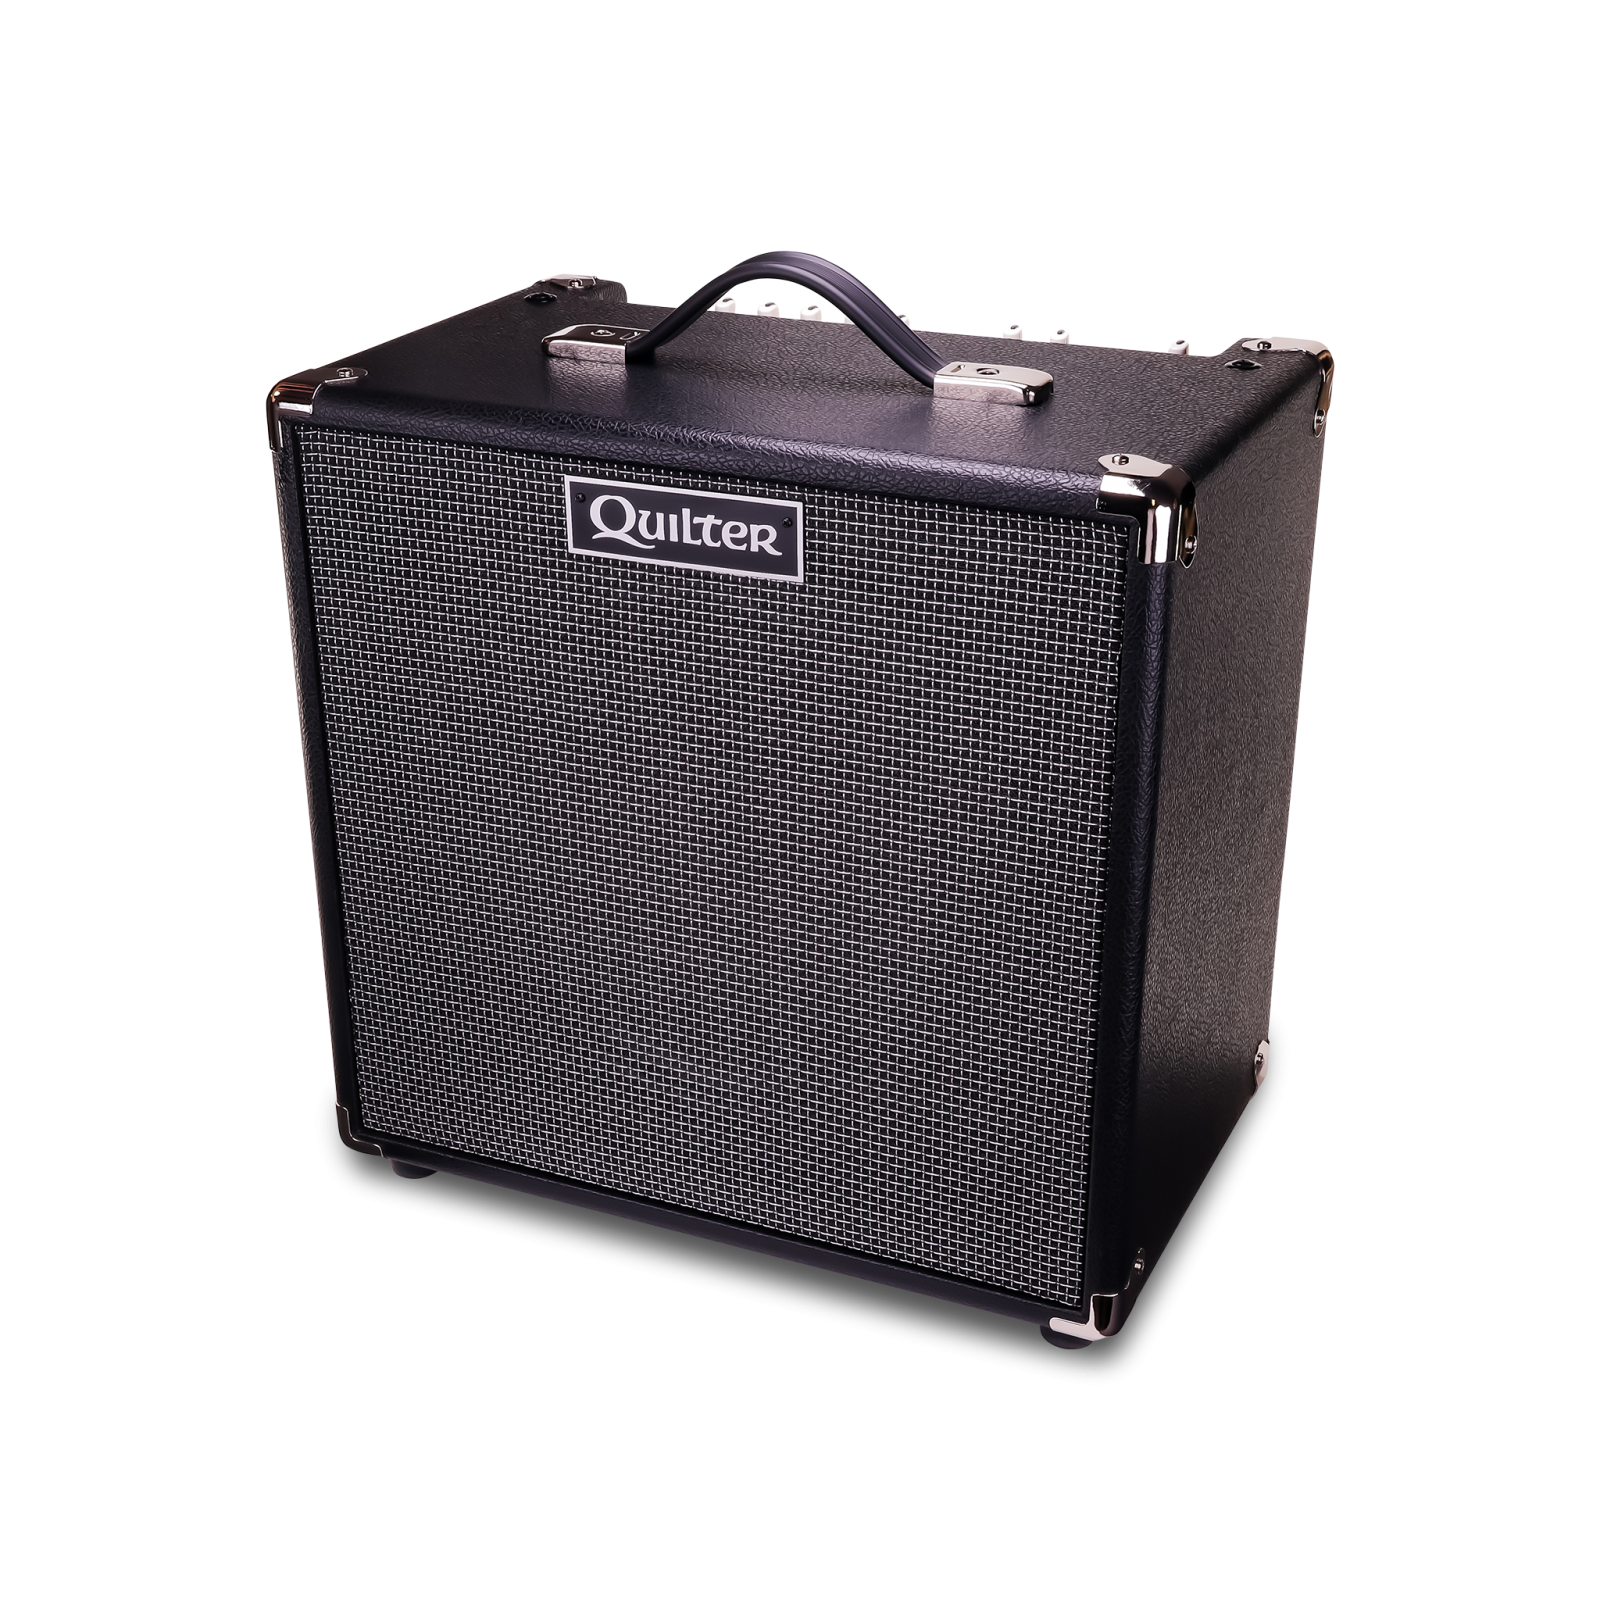 Quilter Aviator Cub Guitar Amplifier